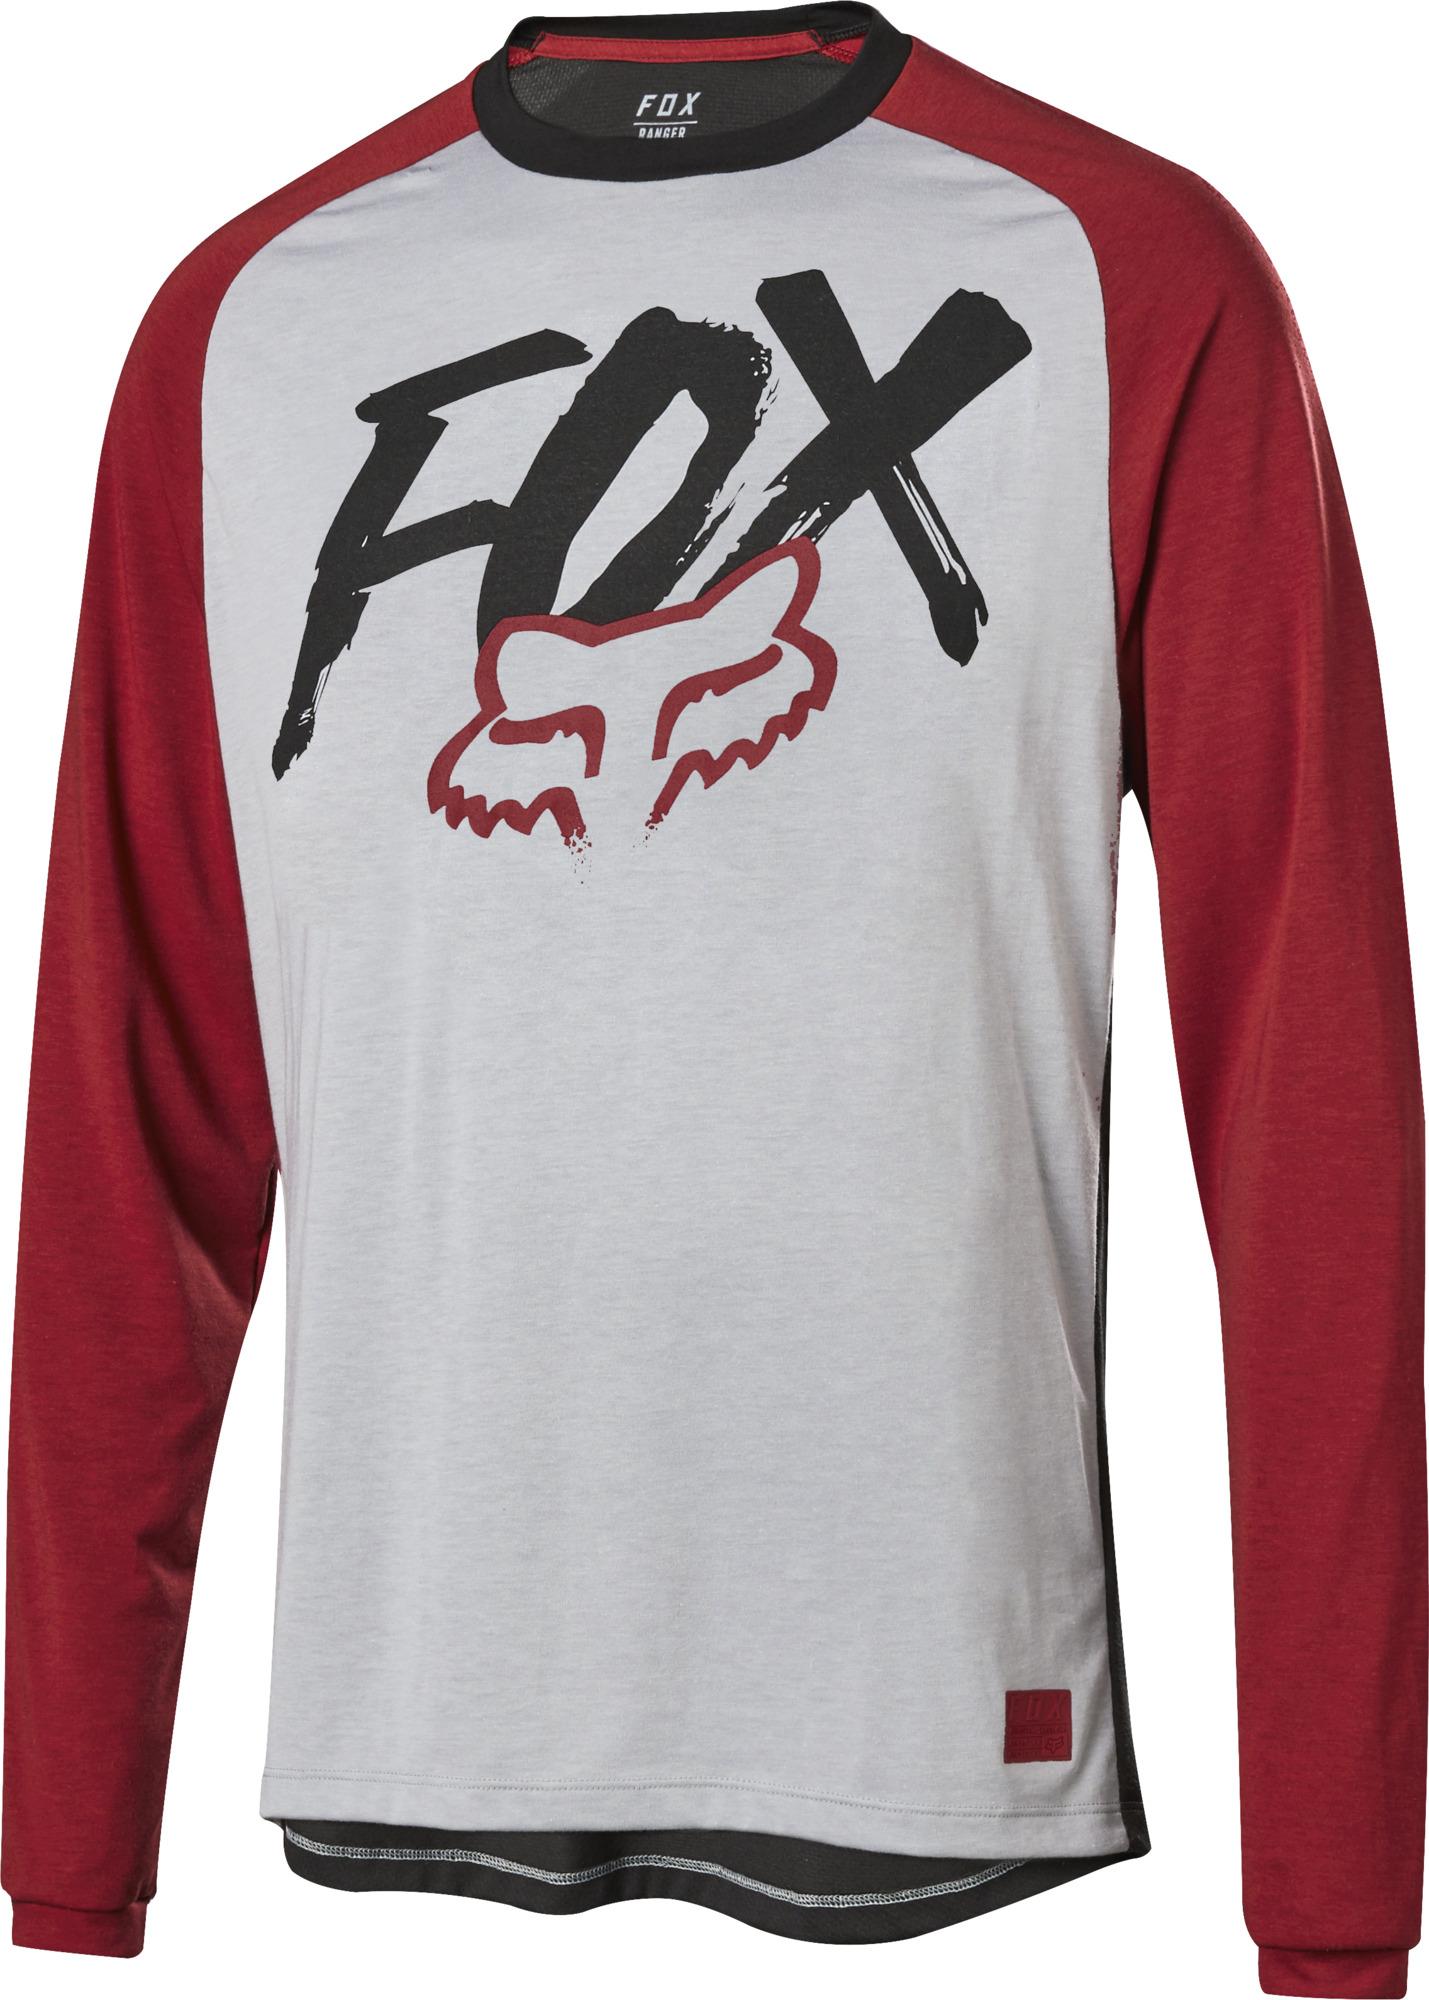 FOX Ranger LS Jersey Long Sleeve Mountain Bike MTB Trail Bicycle Racing Mens Top